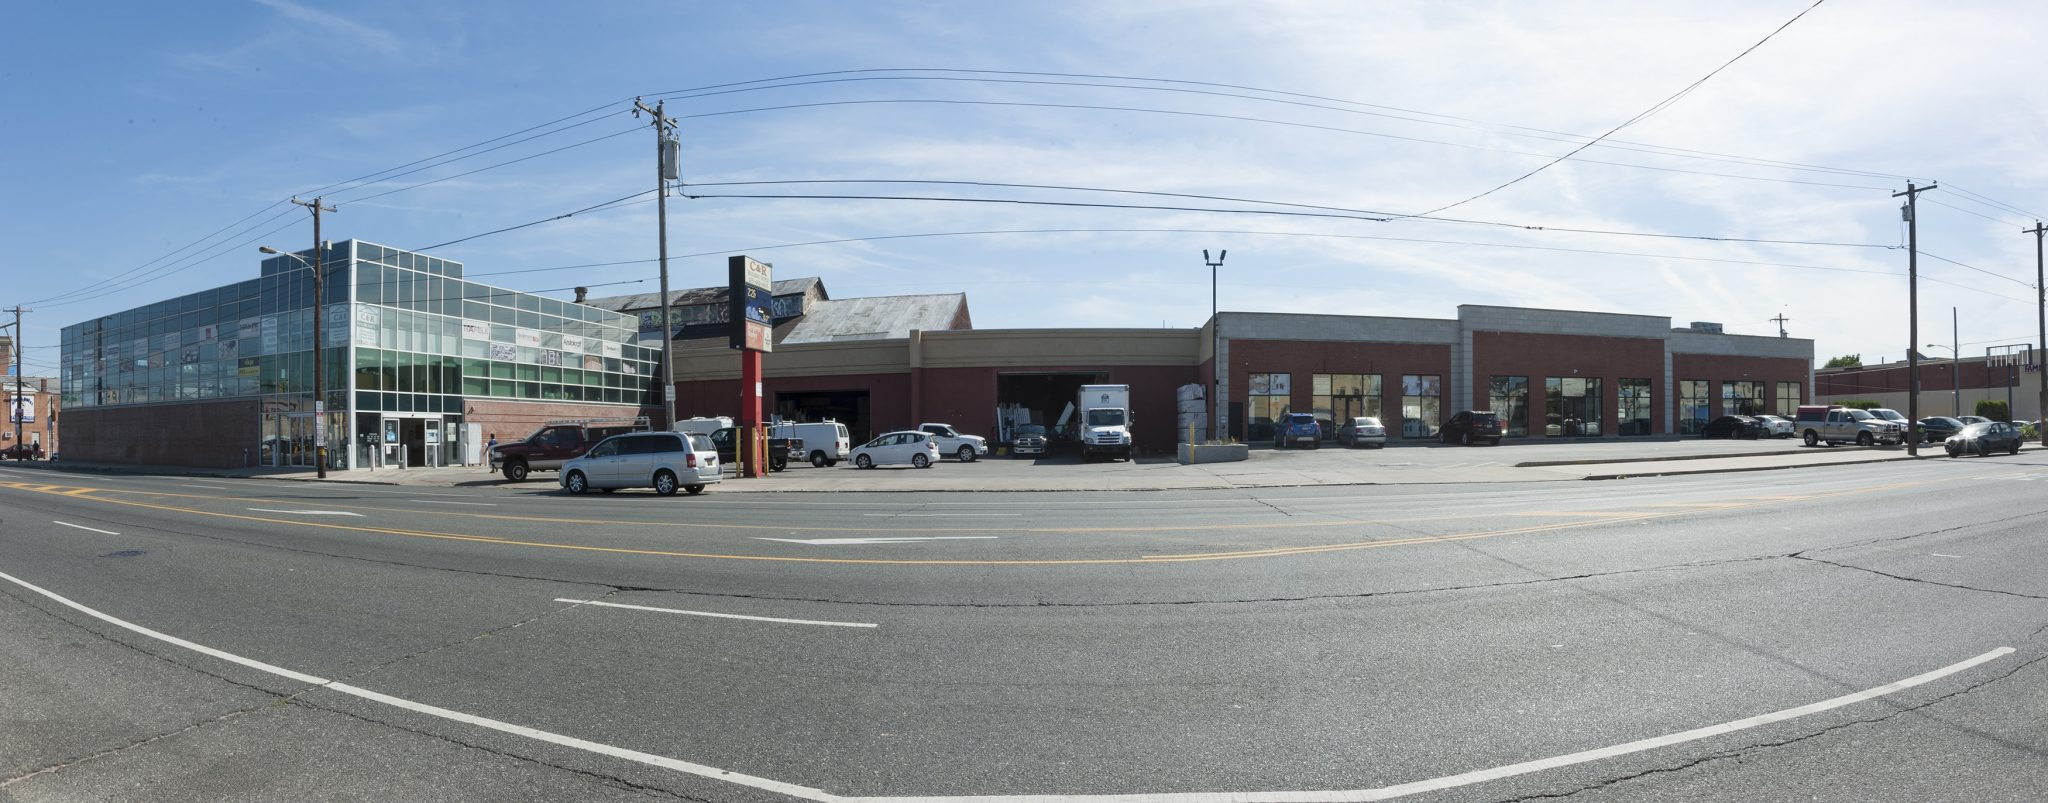 C&R Building Supply Building Supplies Southwest Philadelphia PA